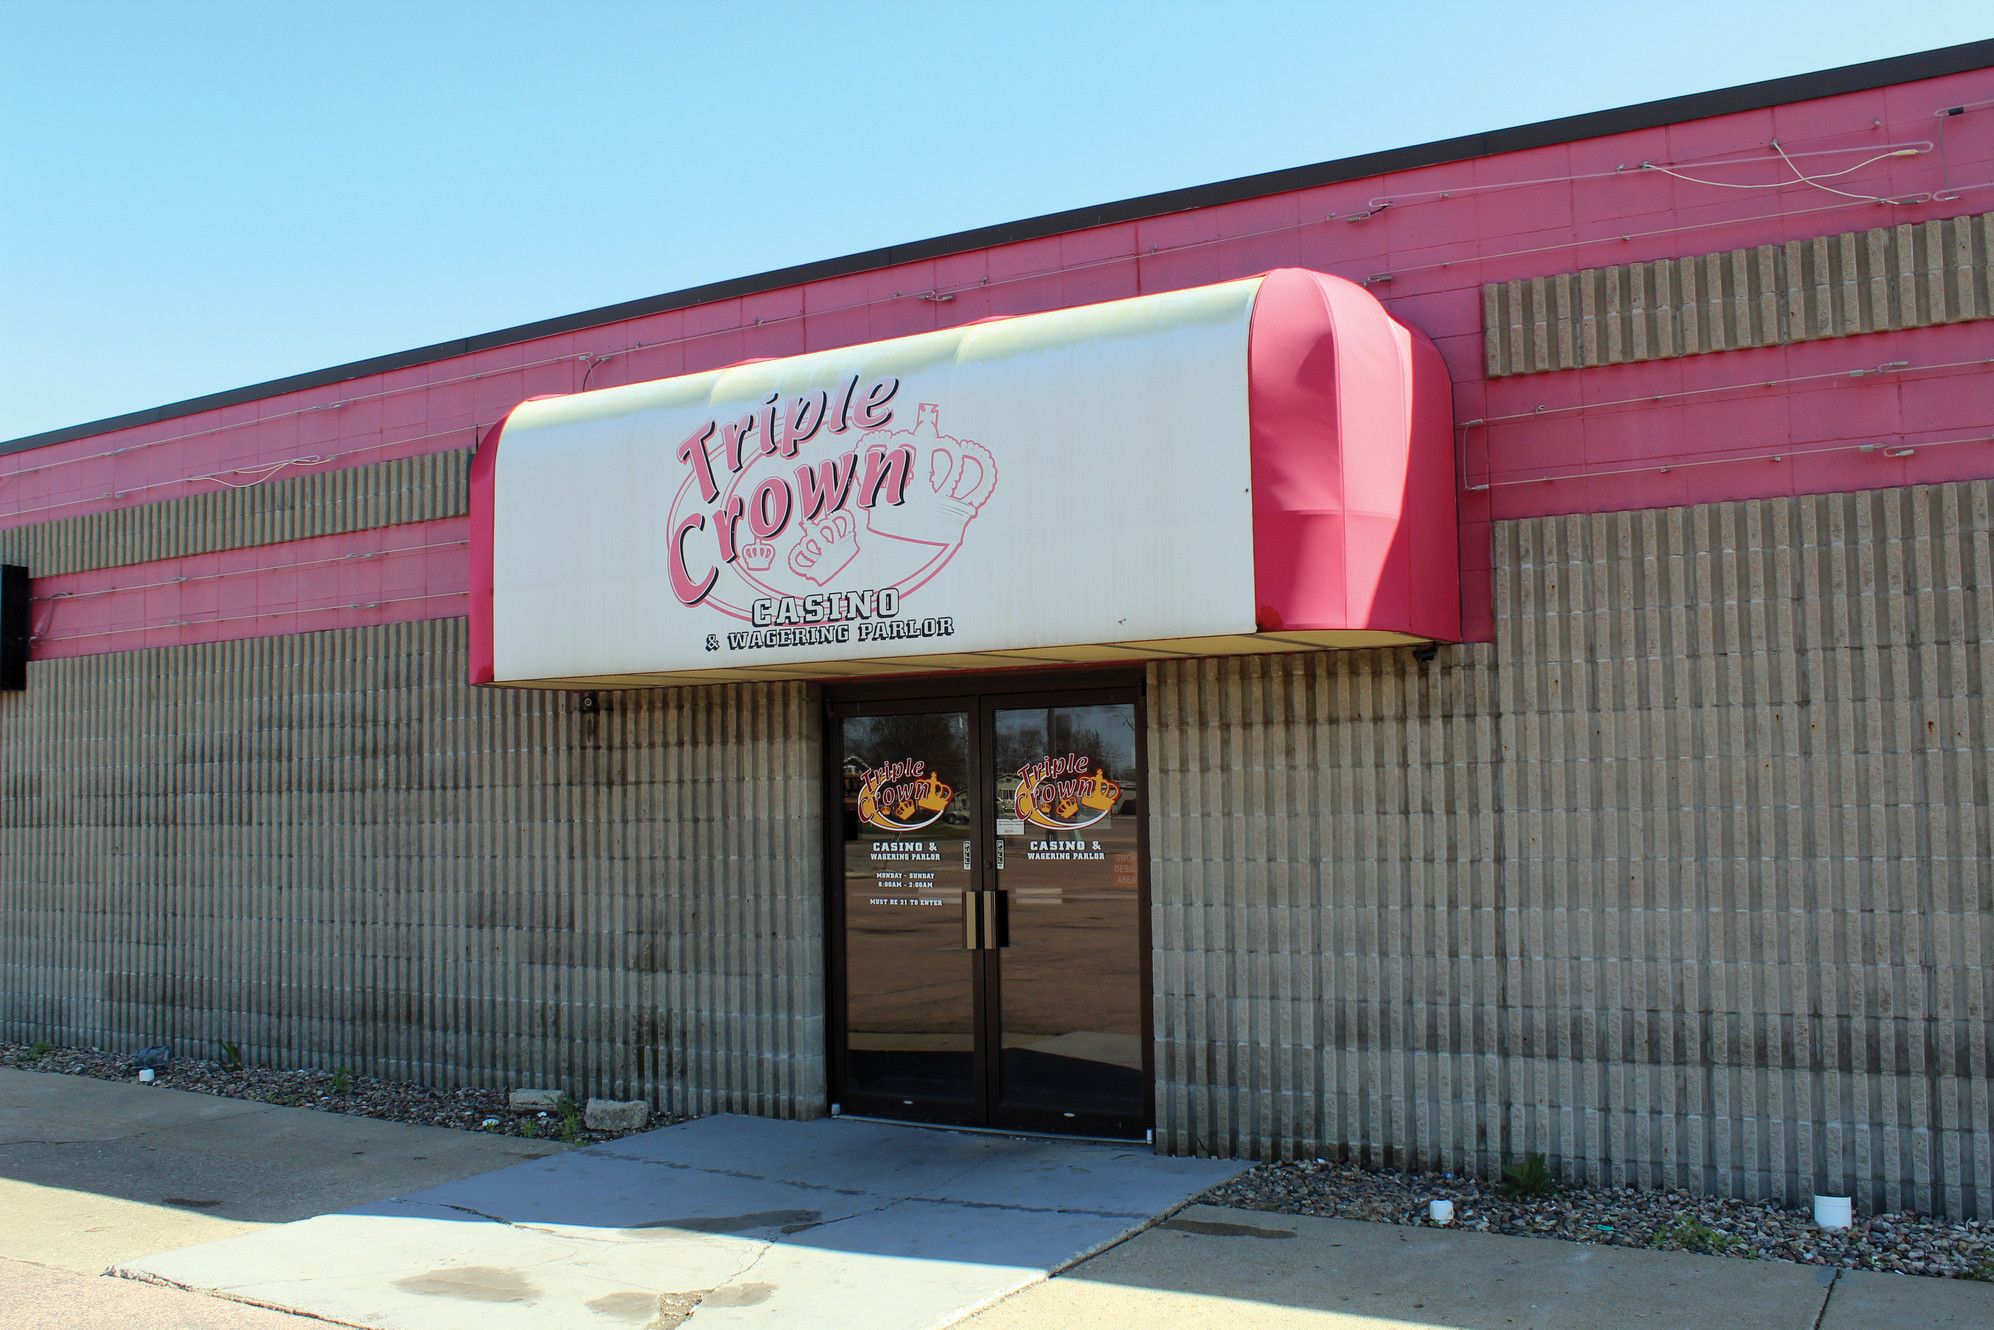 Triple Crown Casino